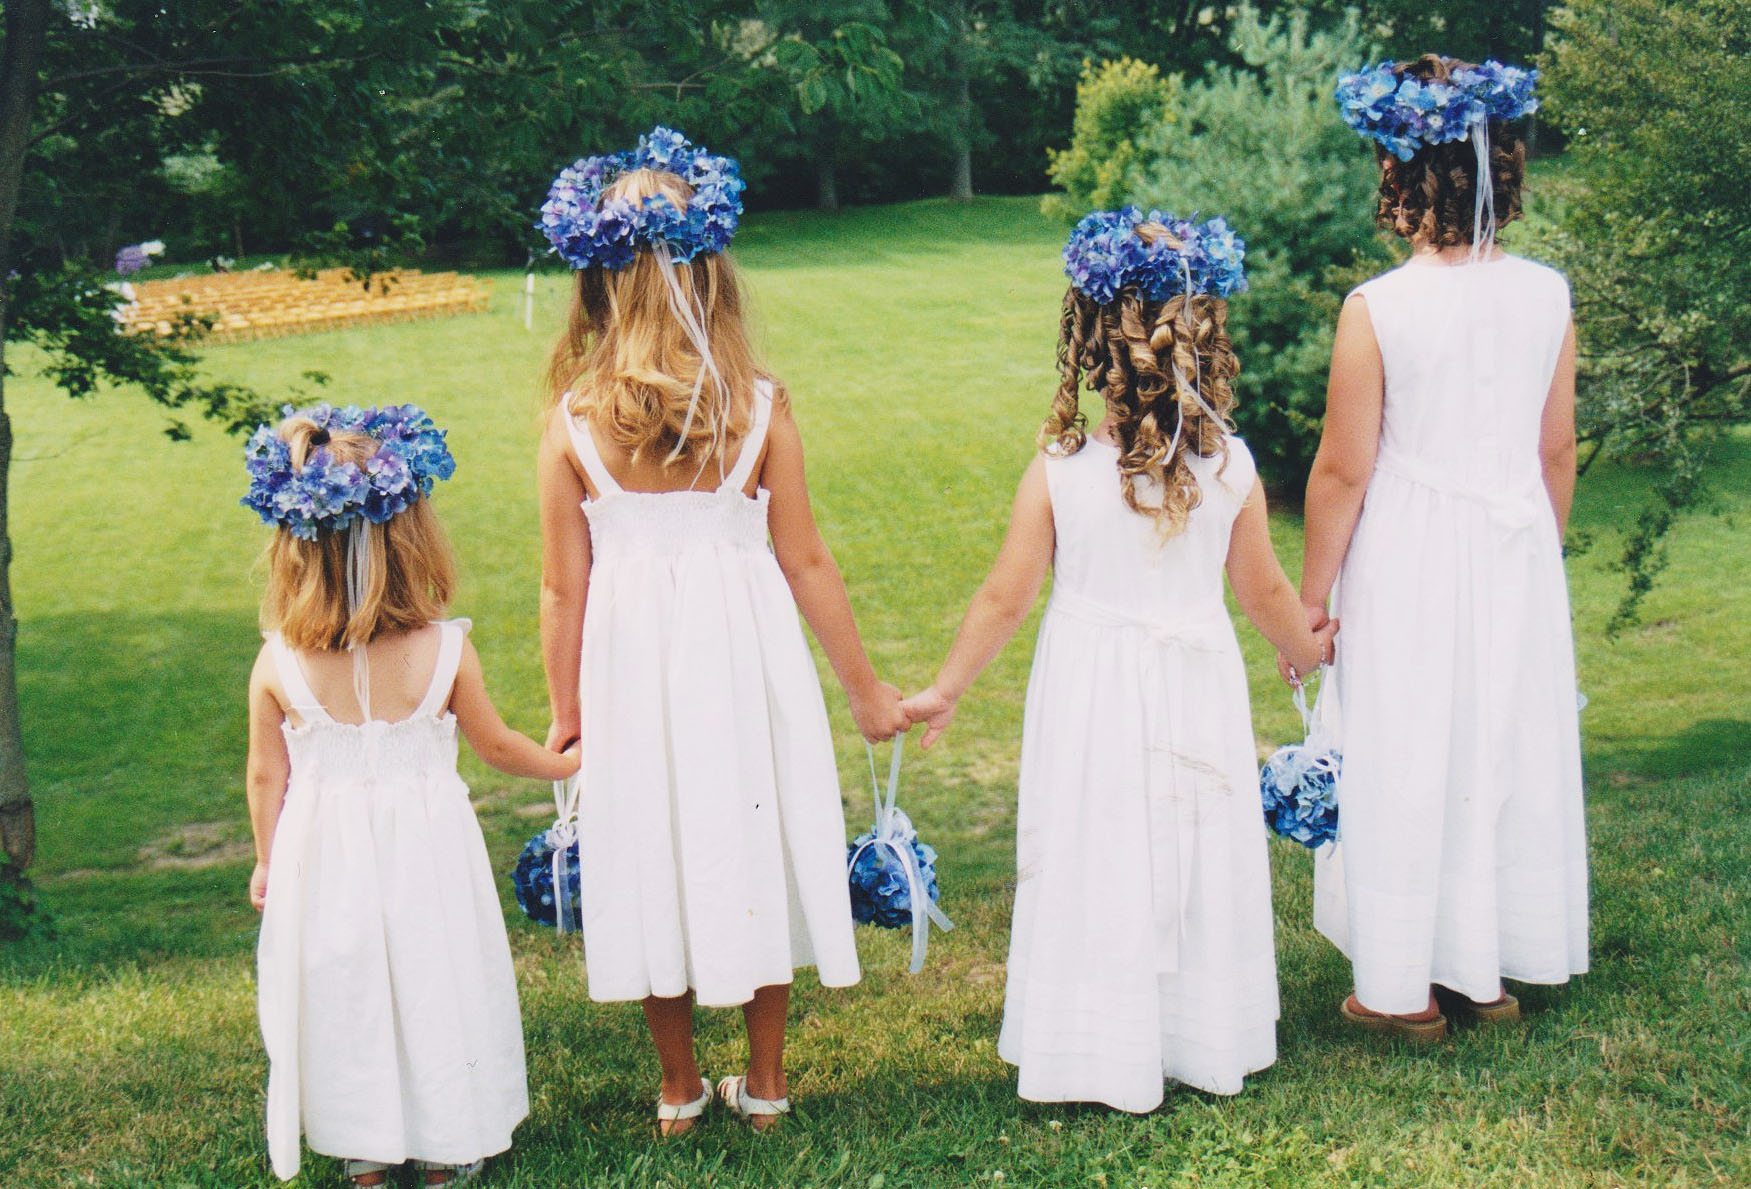 Weaver-Remnant-Fellowship-Wedding-Flowergirls-Hair